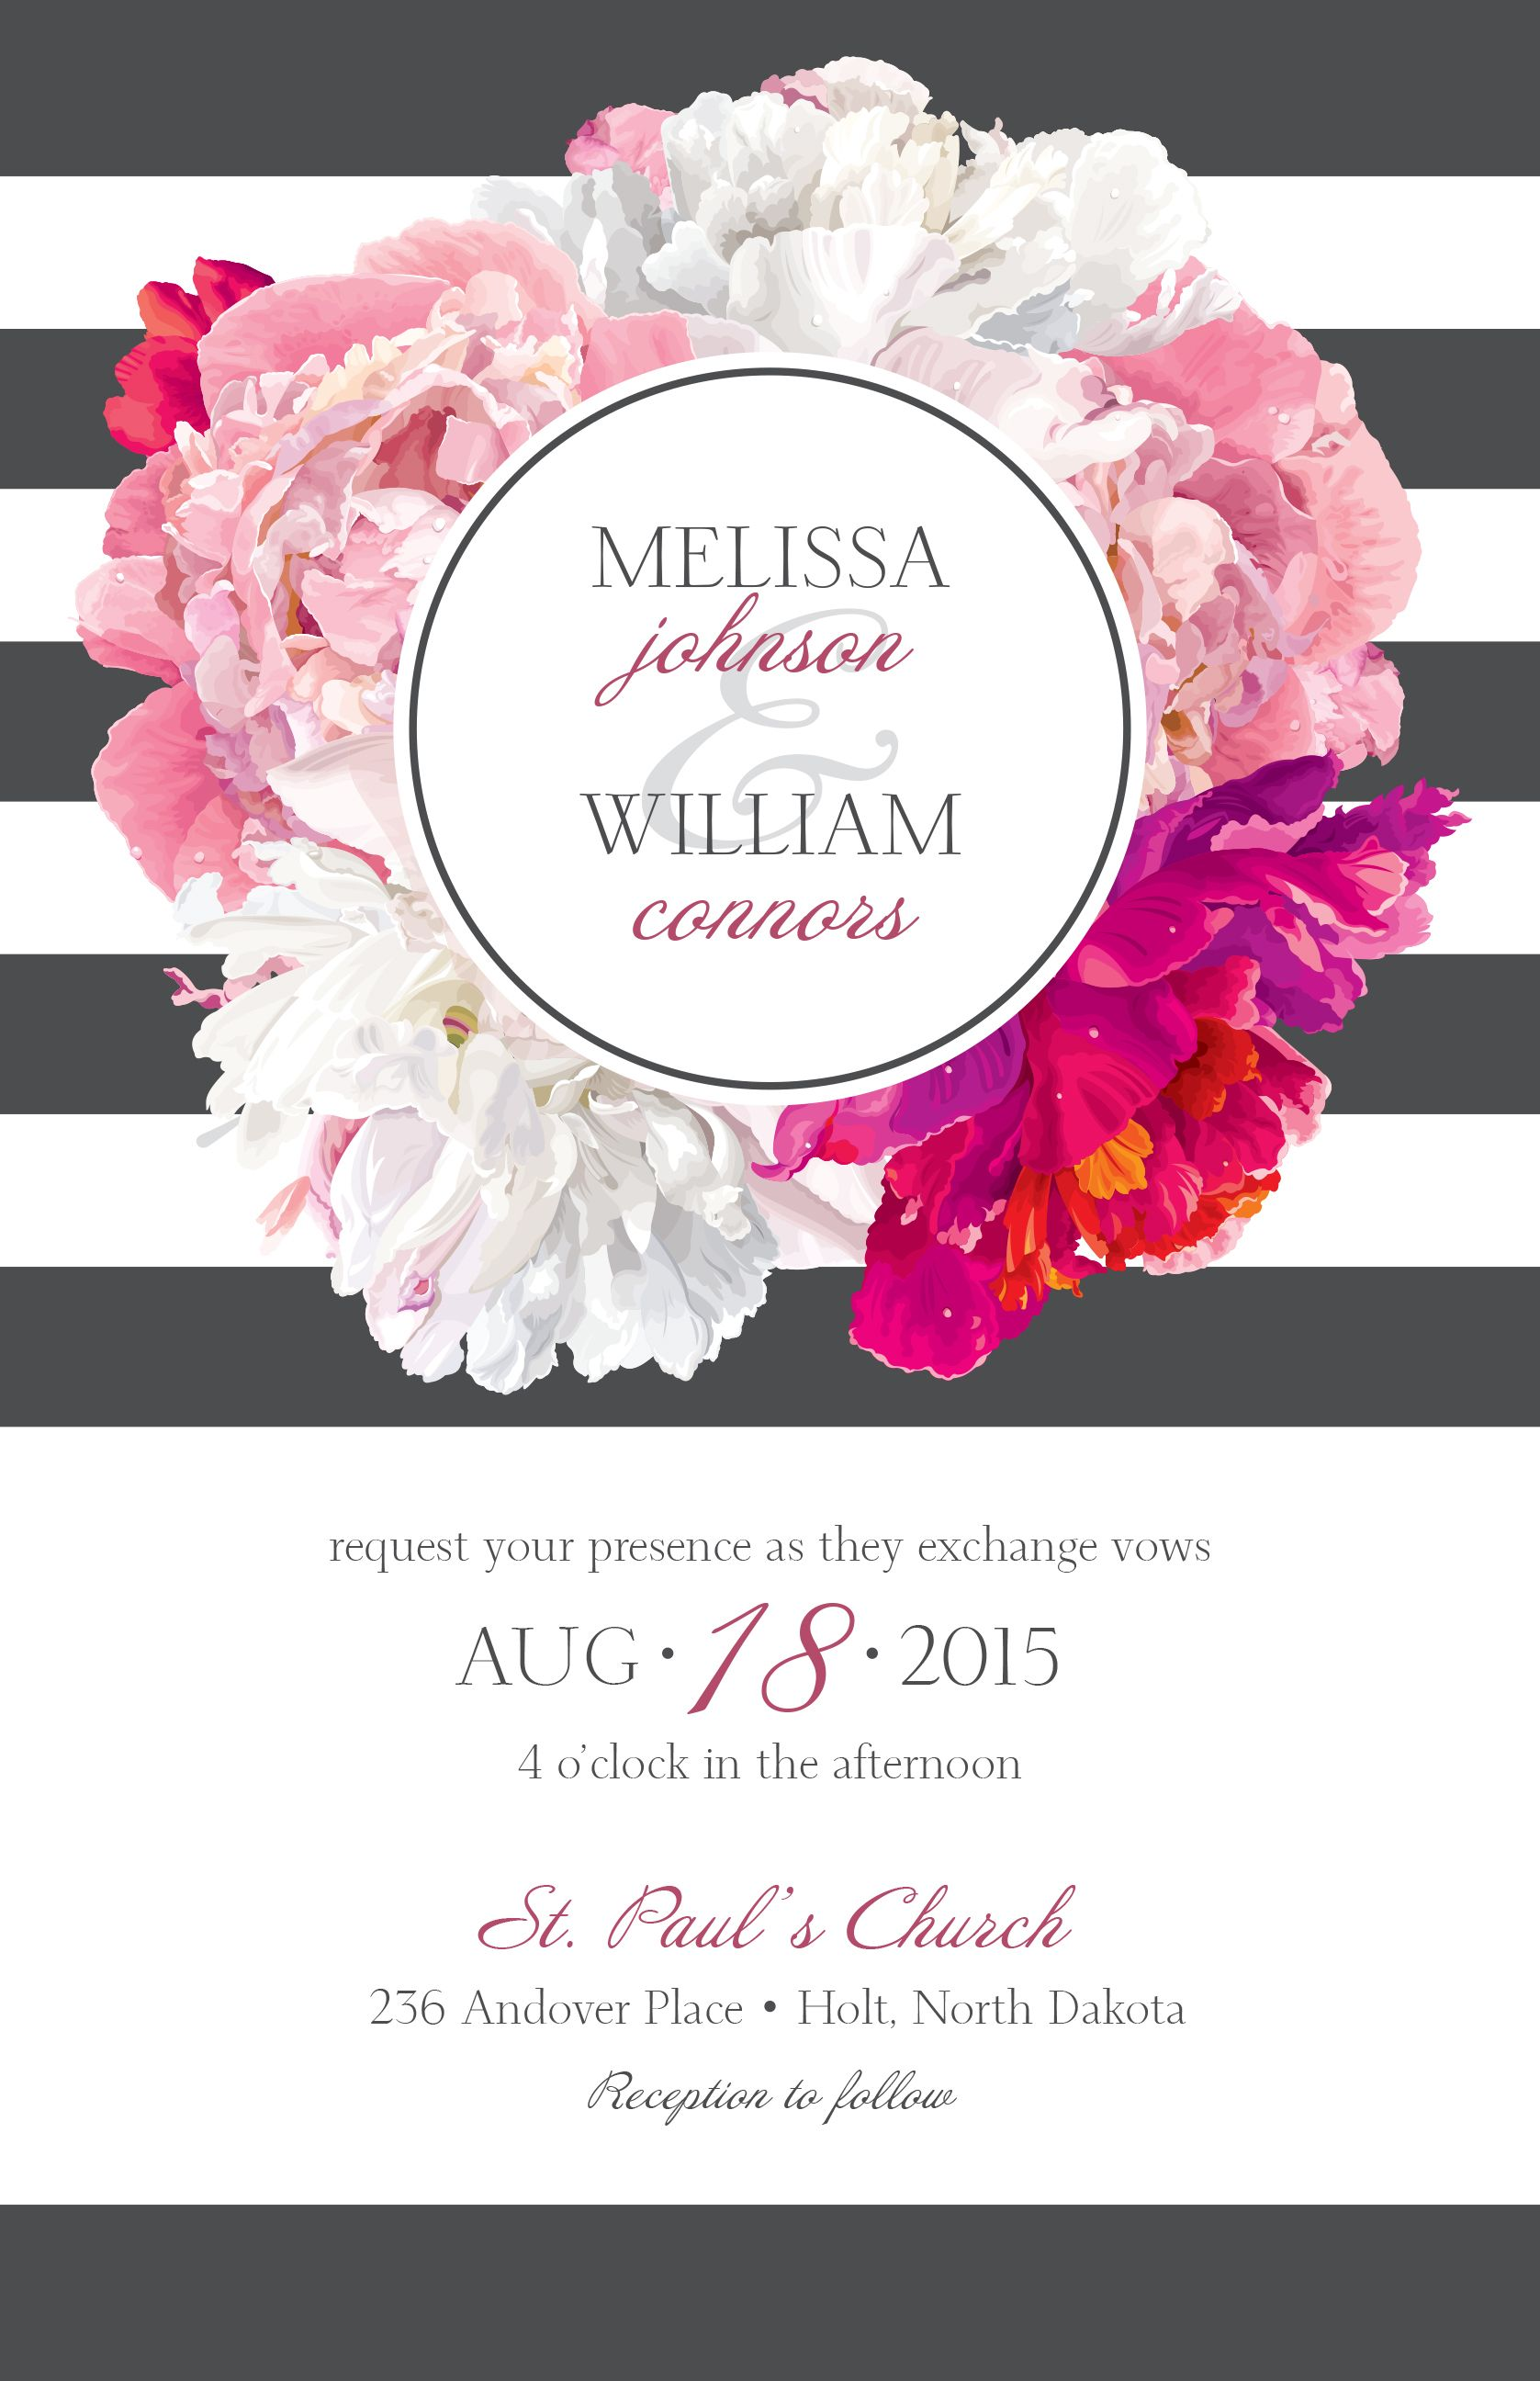 Floral Wedding Invitation Vistaprint Wedding Invitations Custom Wedding Stationery Custom Wedding Invitations